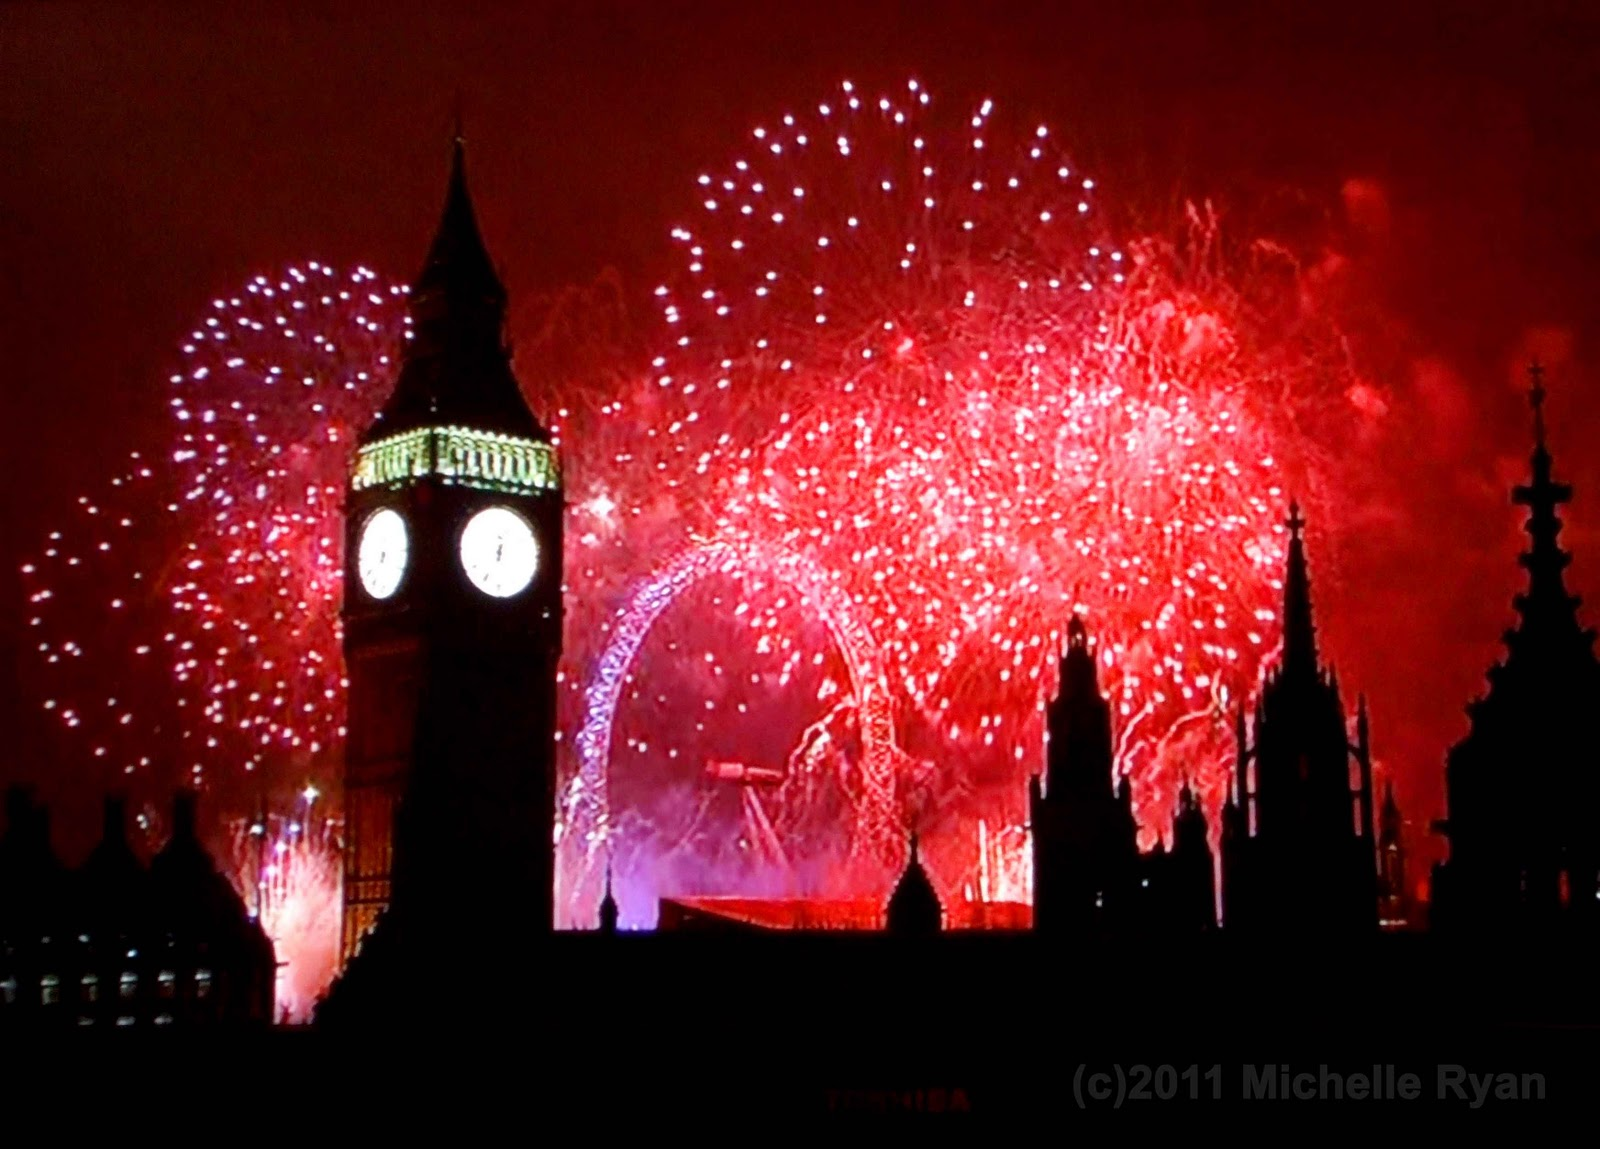 http://4.bp.blogspot.com/_iCD1aRrPbEA/TSCKXUF8NII/AAAAAAAABlY/A_aSkADgQ8Q/s1600/new+year+2011a.jpg